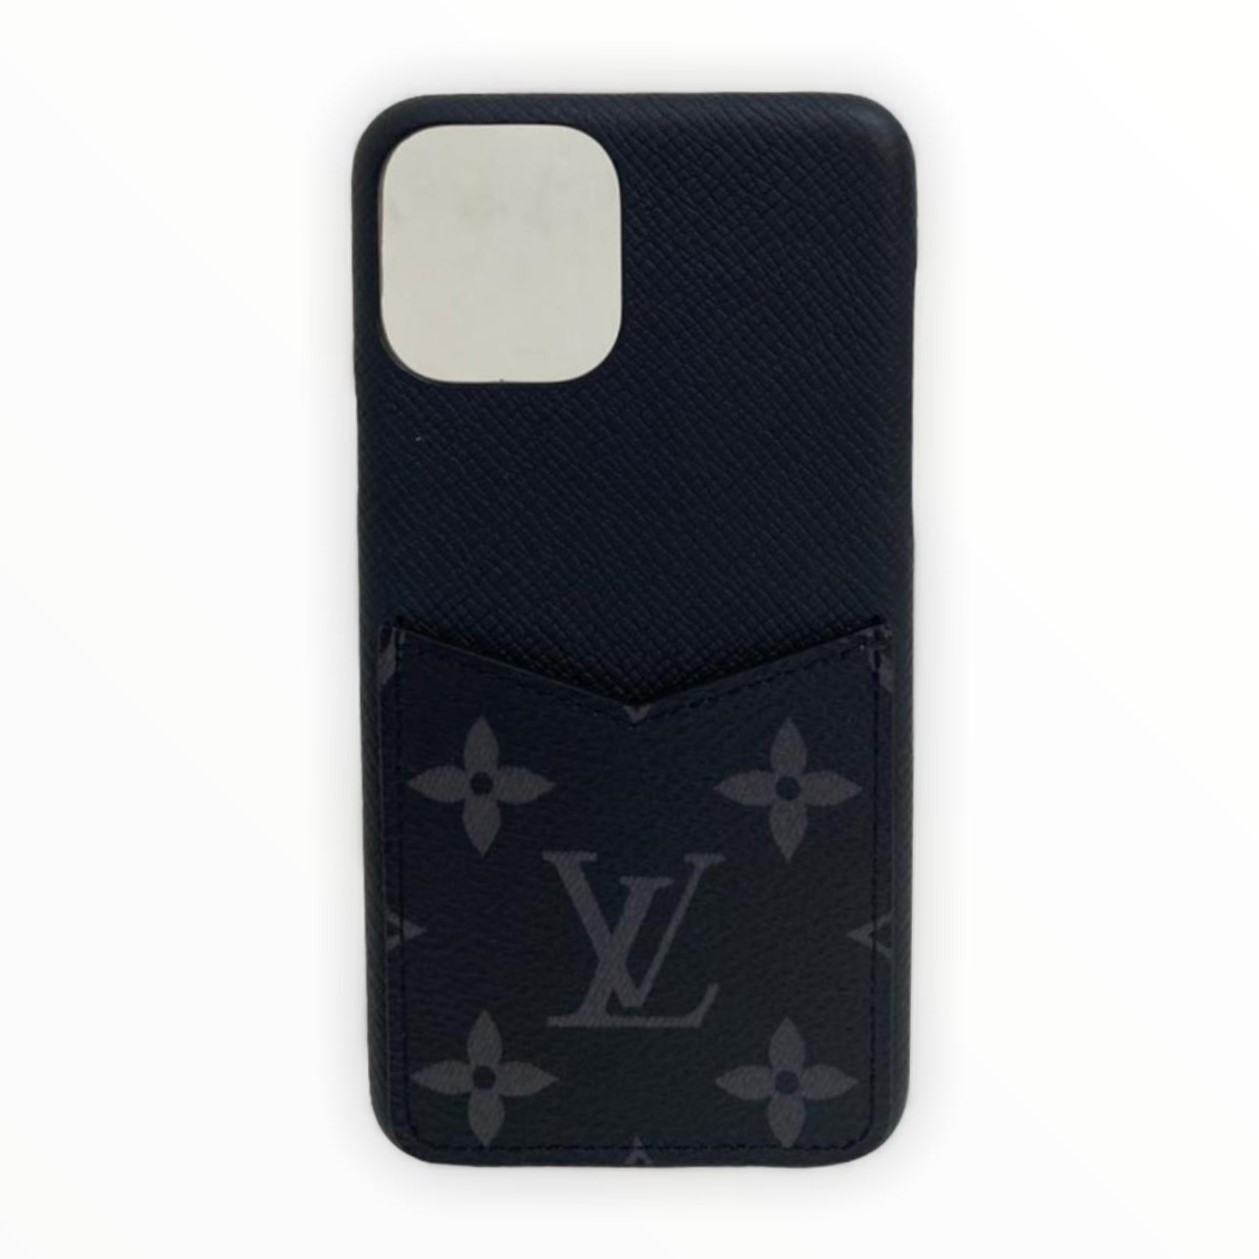 Capa de Celular Louis Vuitton IPhone 11 Pro